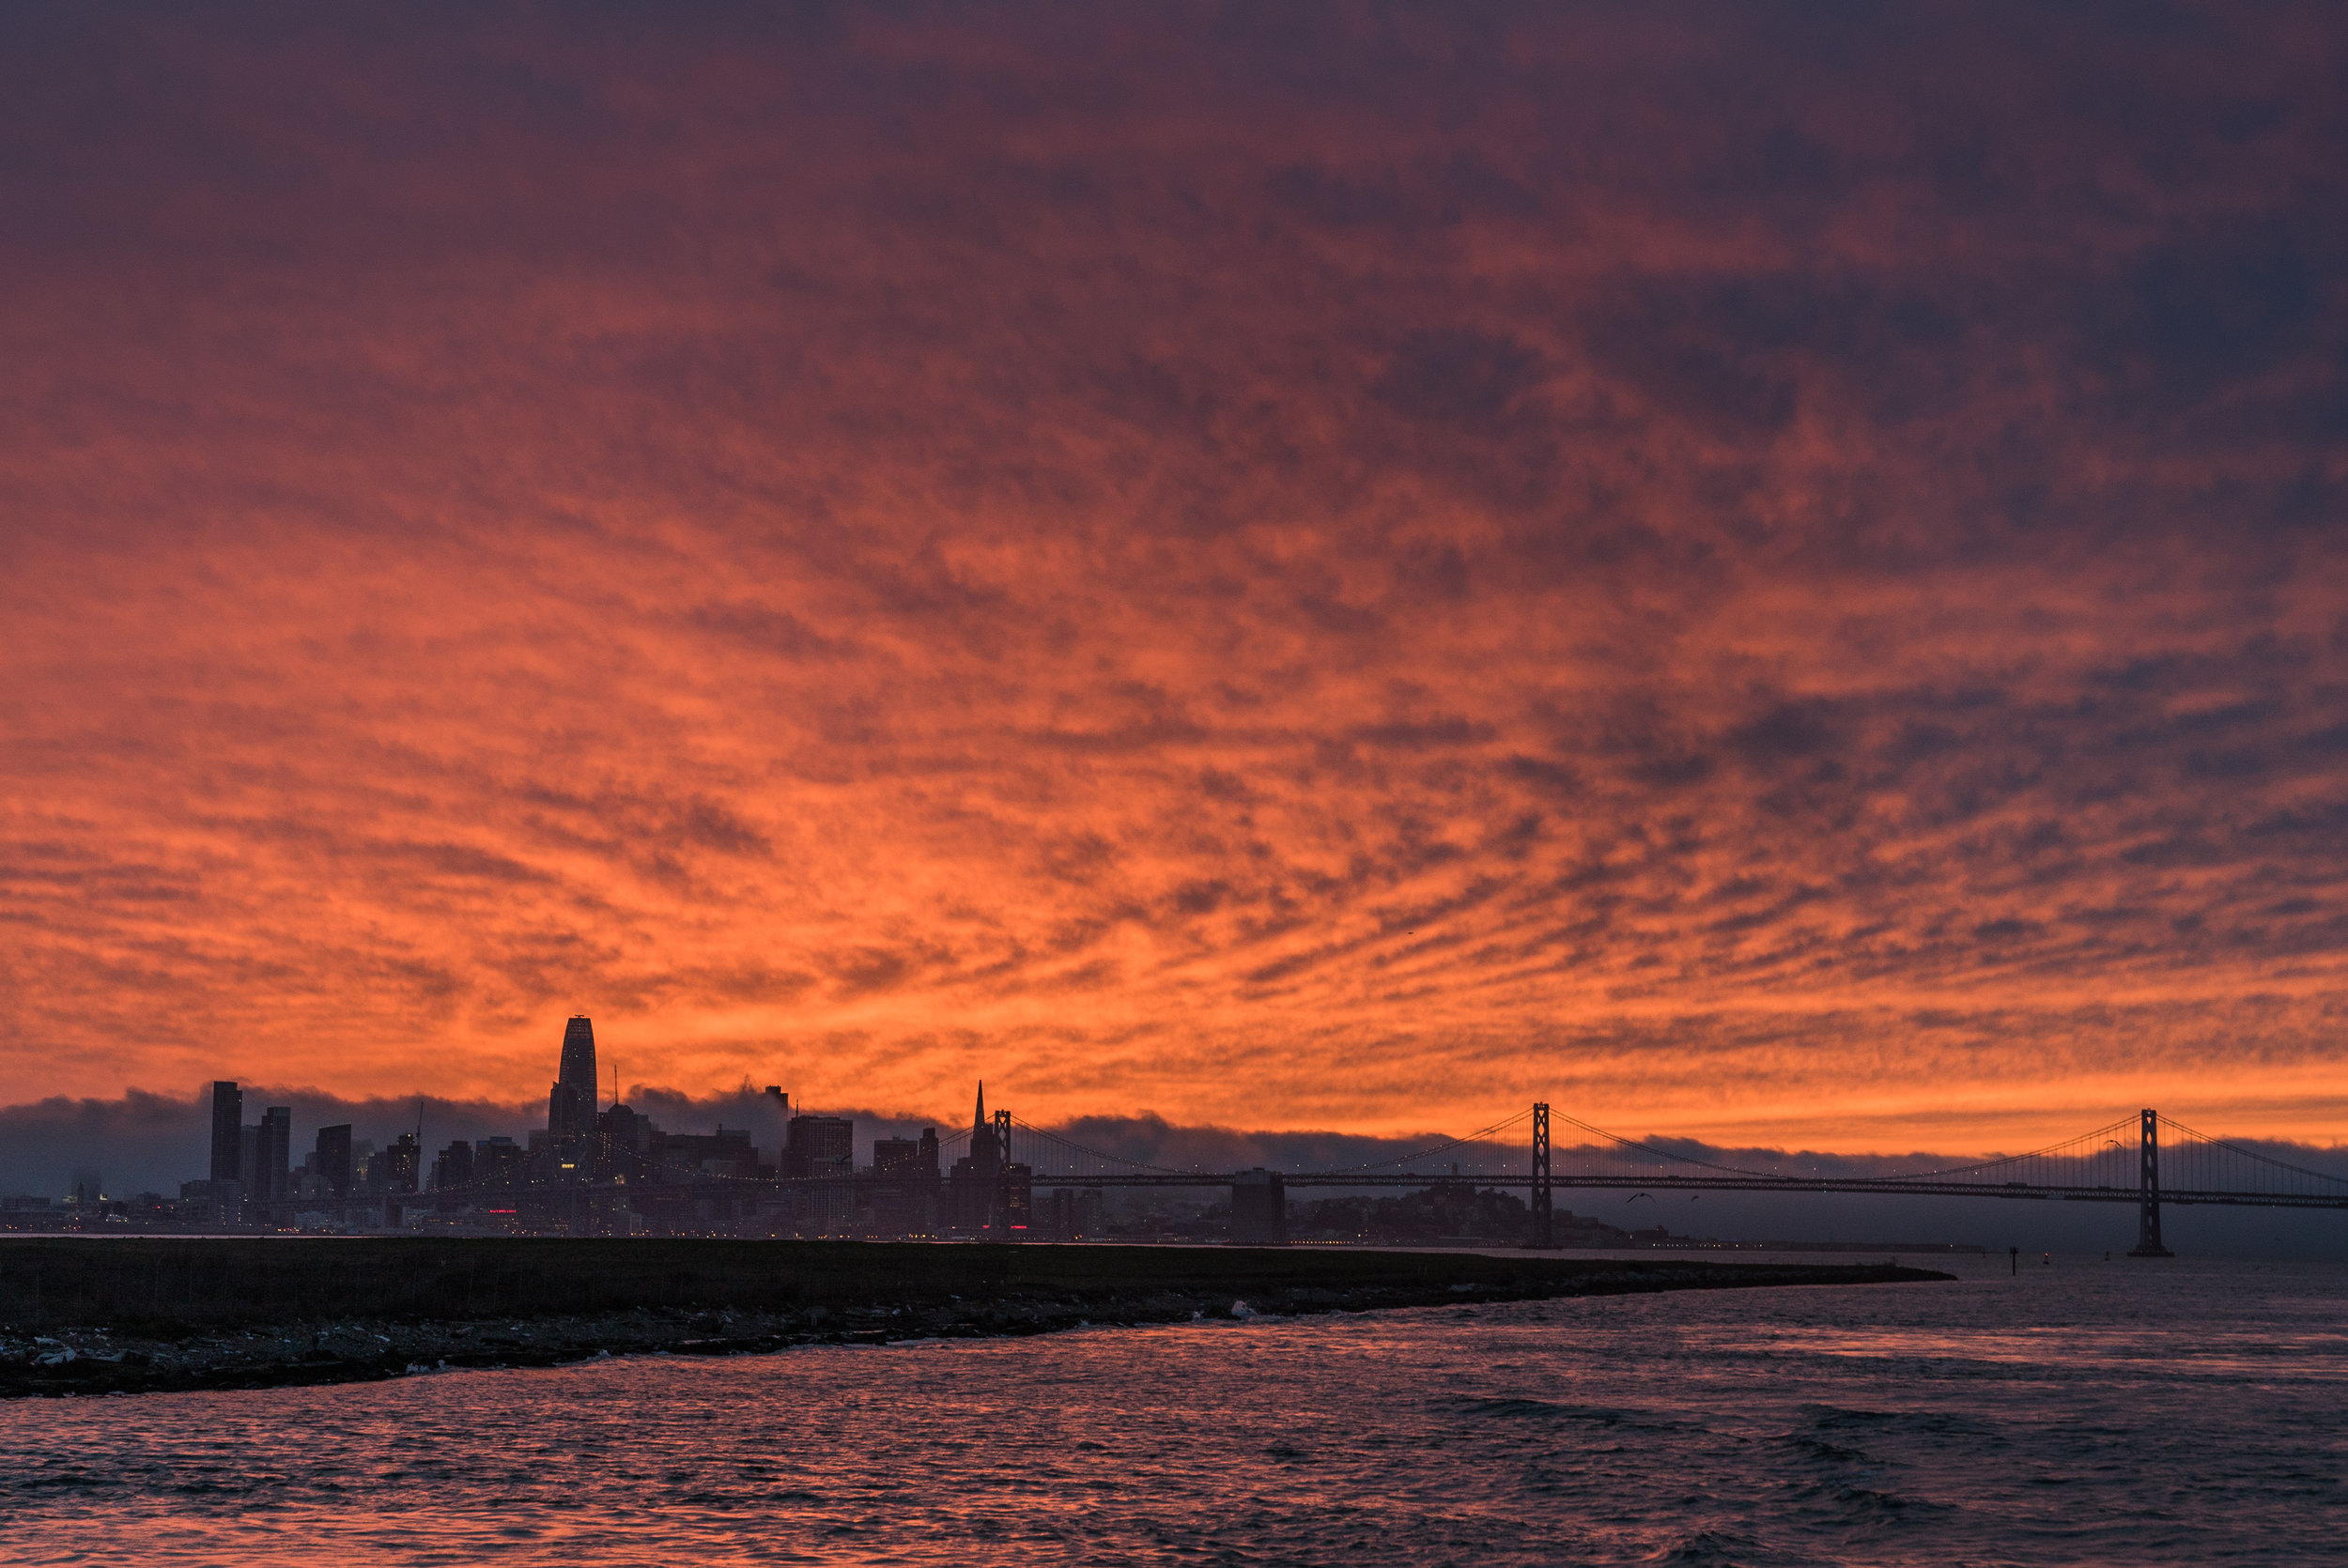 20180309-ferry_sunset-001.jpg